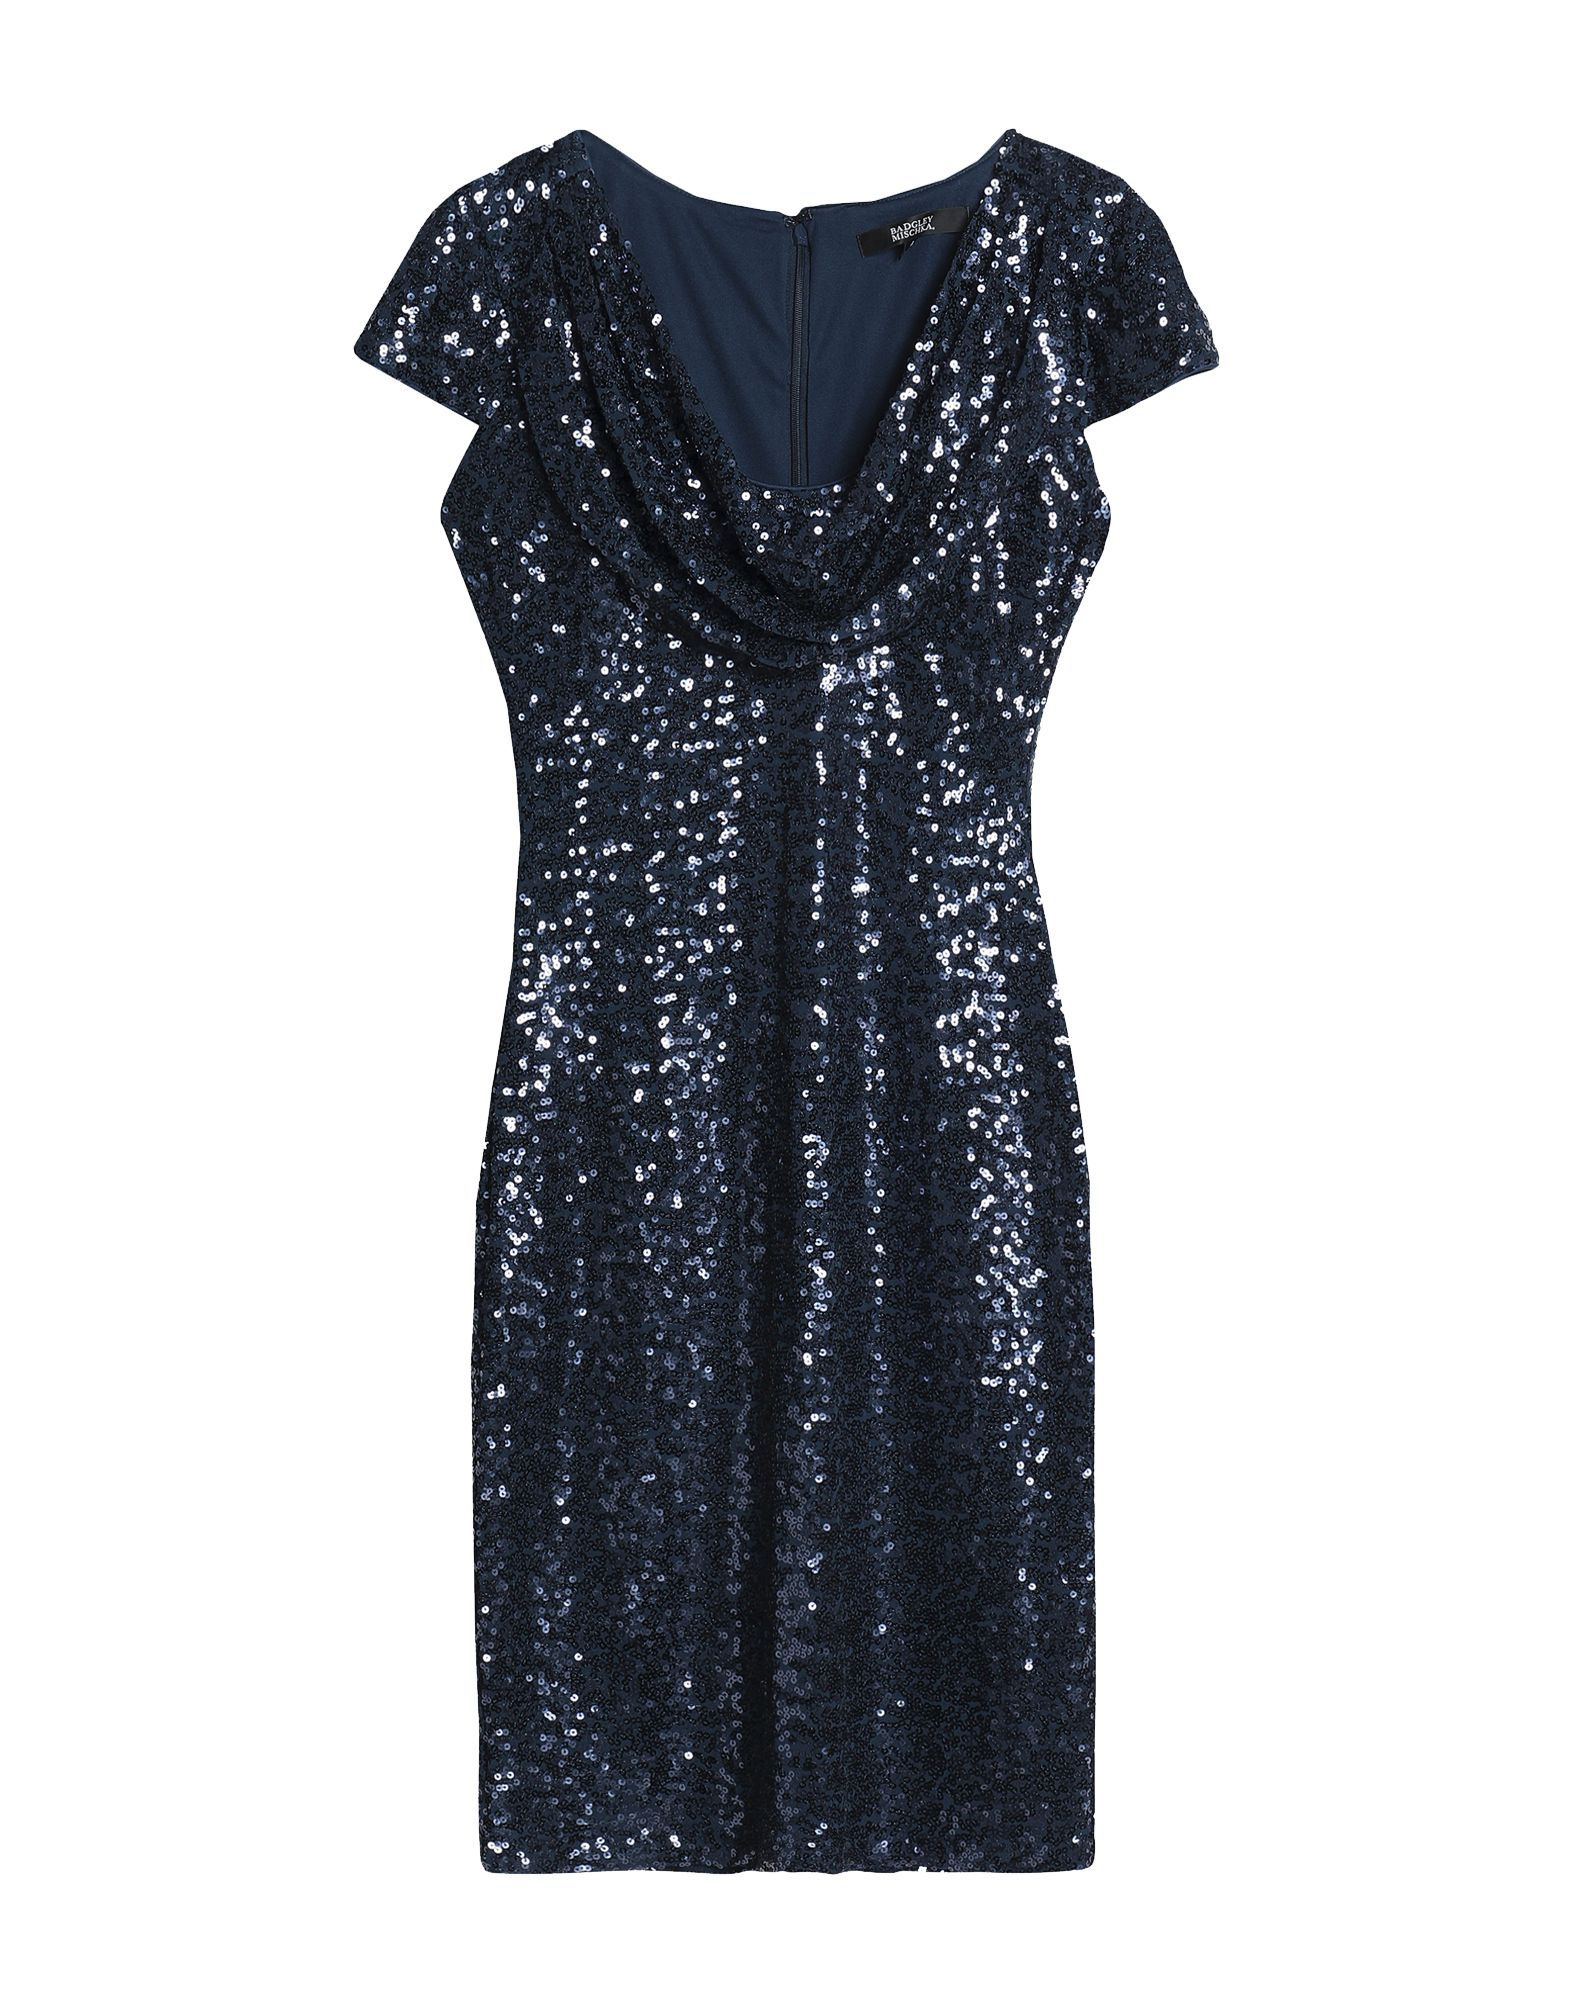 e2fc951e6b09 Φορεμα παγιετες - Σελίδα 6